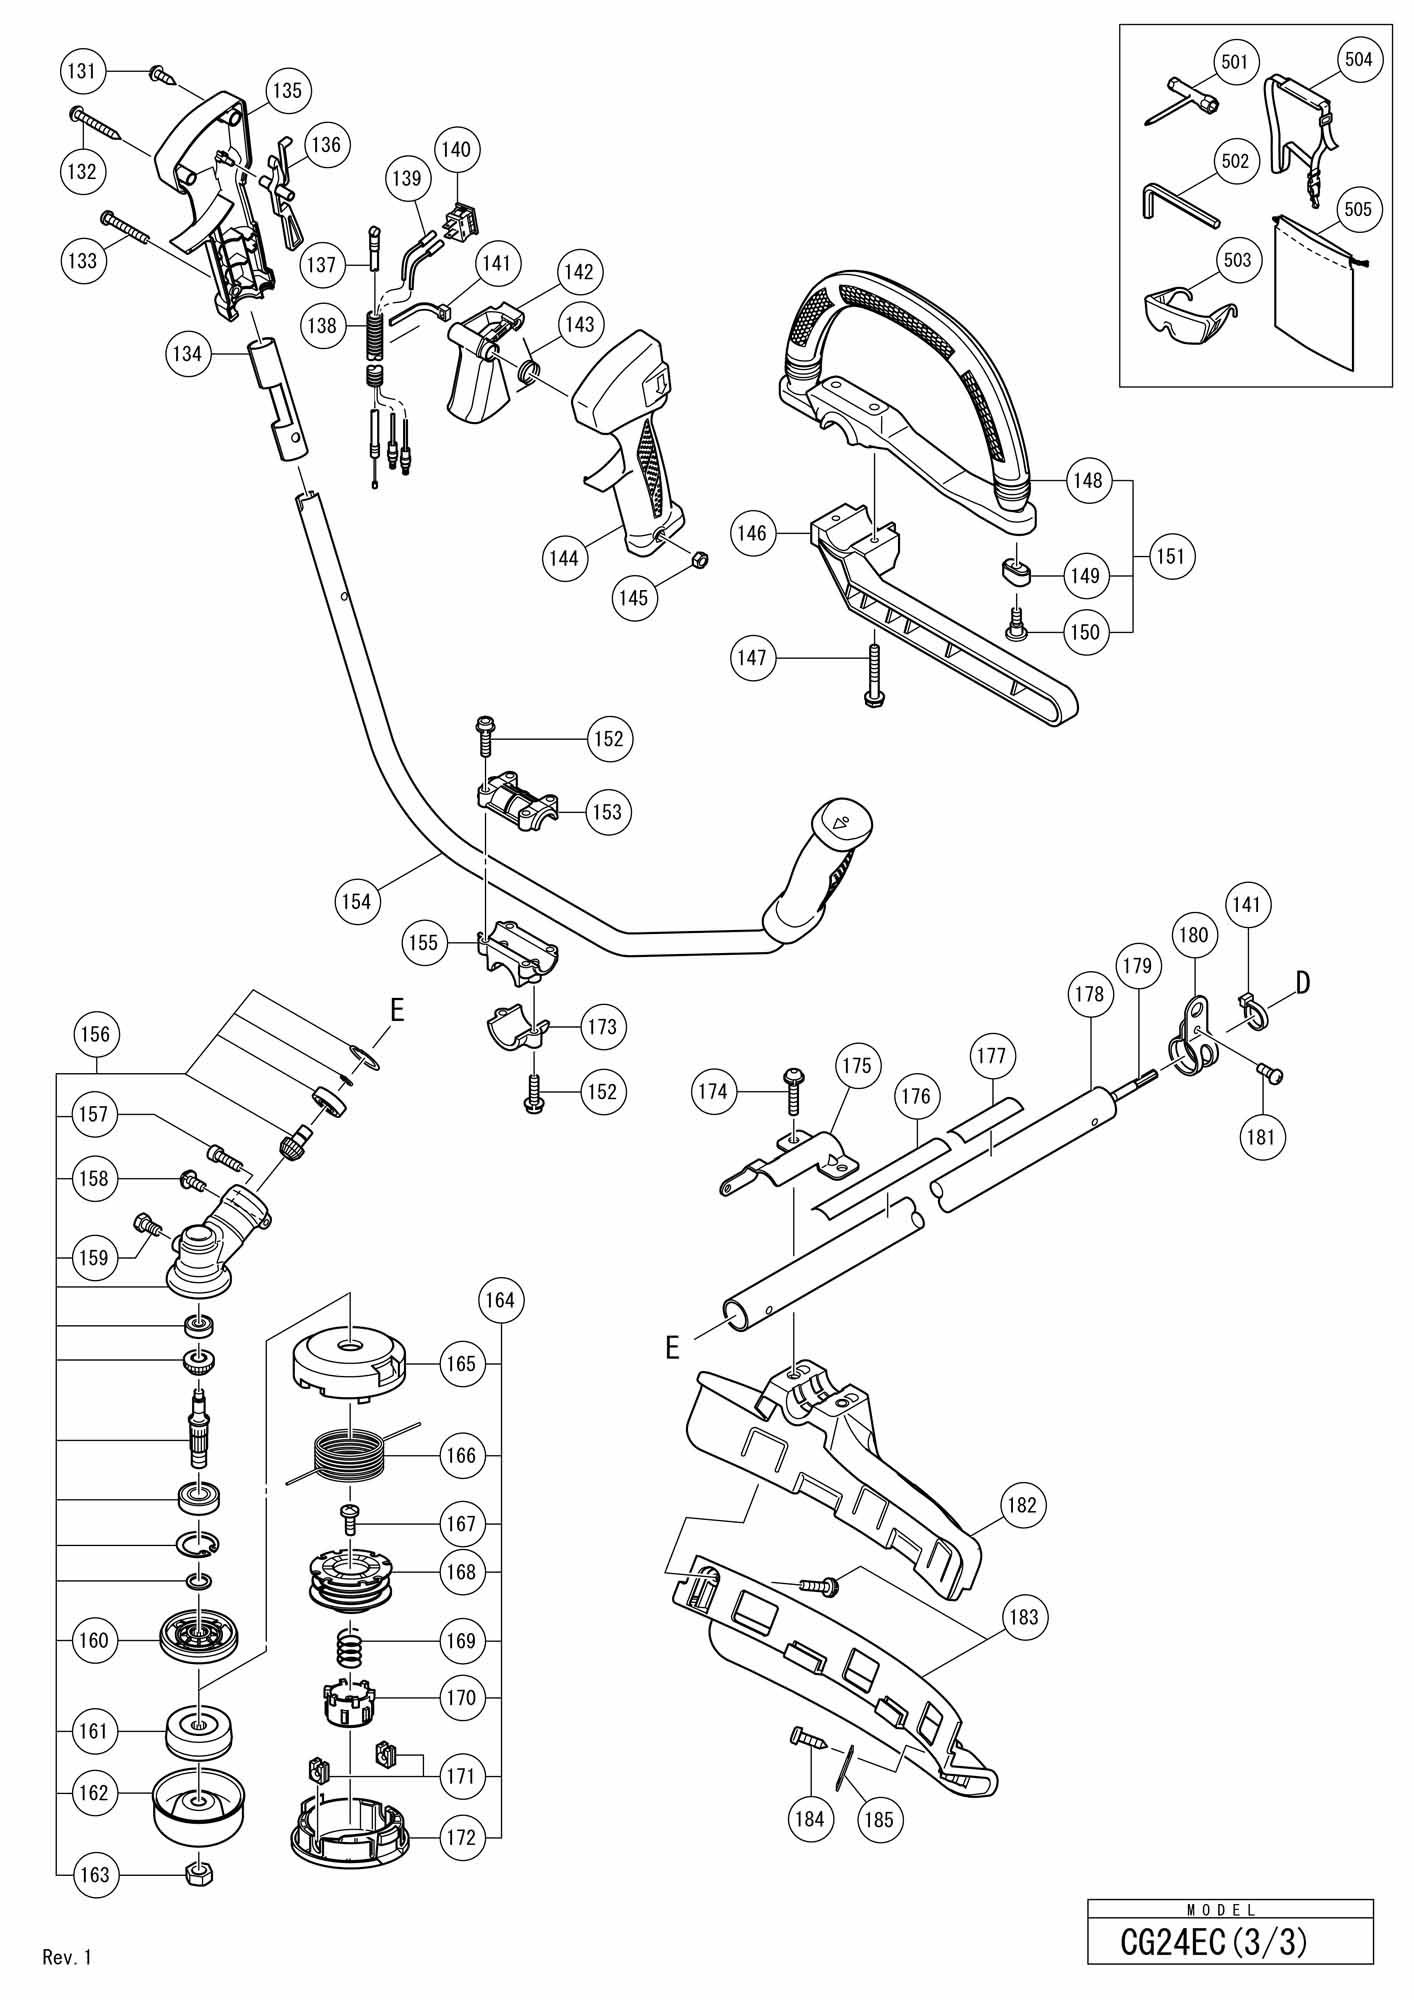 Hitachi Engine Grass Trimmer/brush Cutter Cg 24ec SPARE